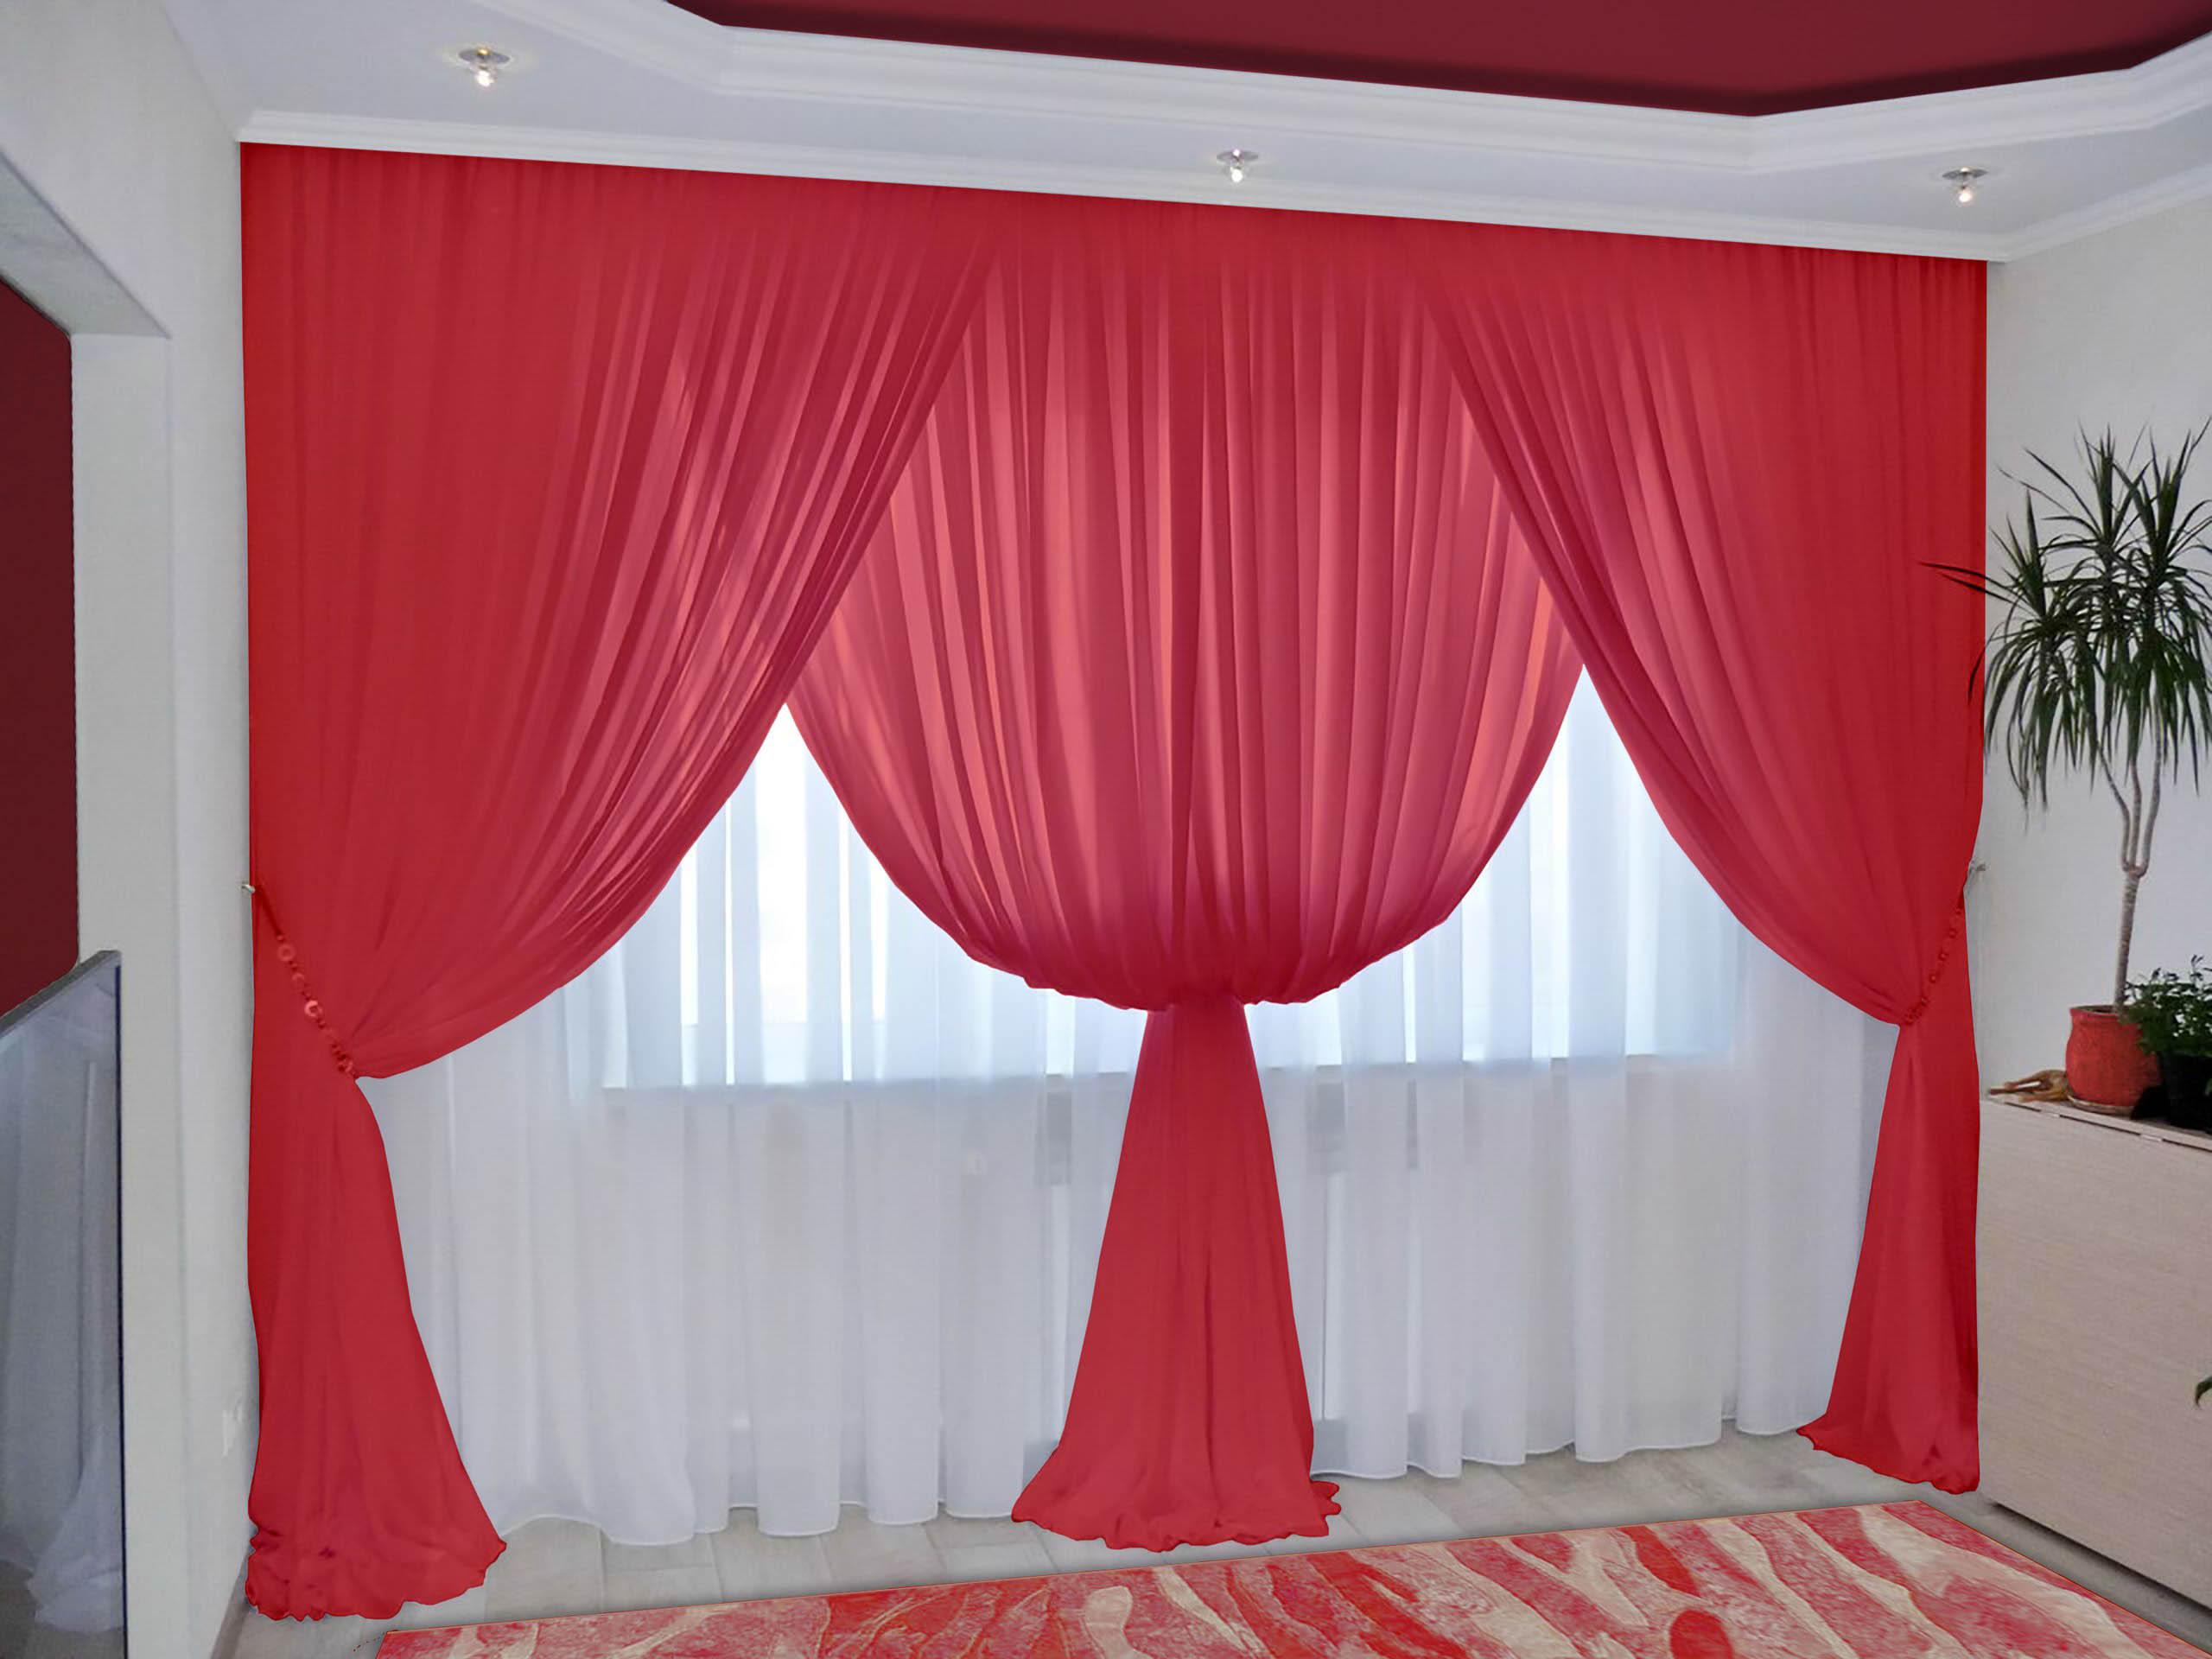 Шторы РеалТекс Классические шторы Augustine Цвет: Алый шторы реалтекс классические шторы alberta цвет персиковый молочный